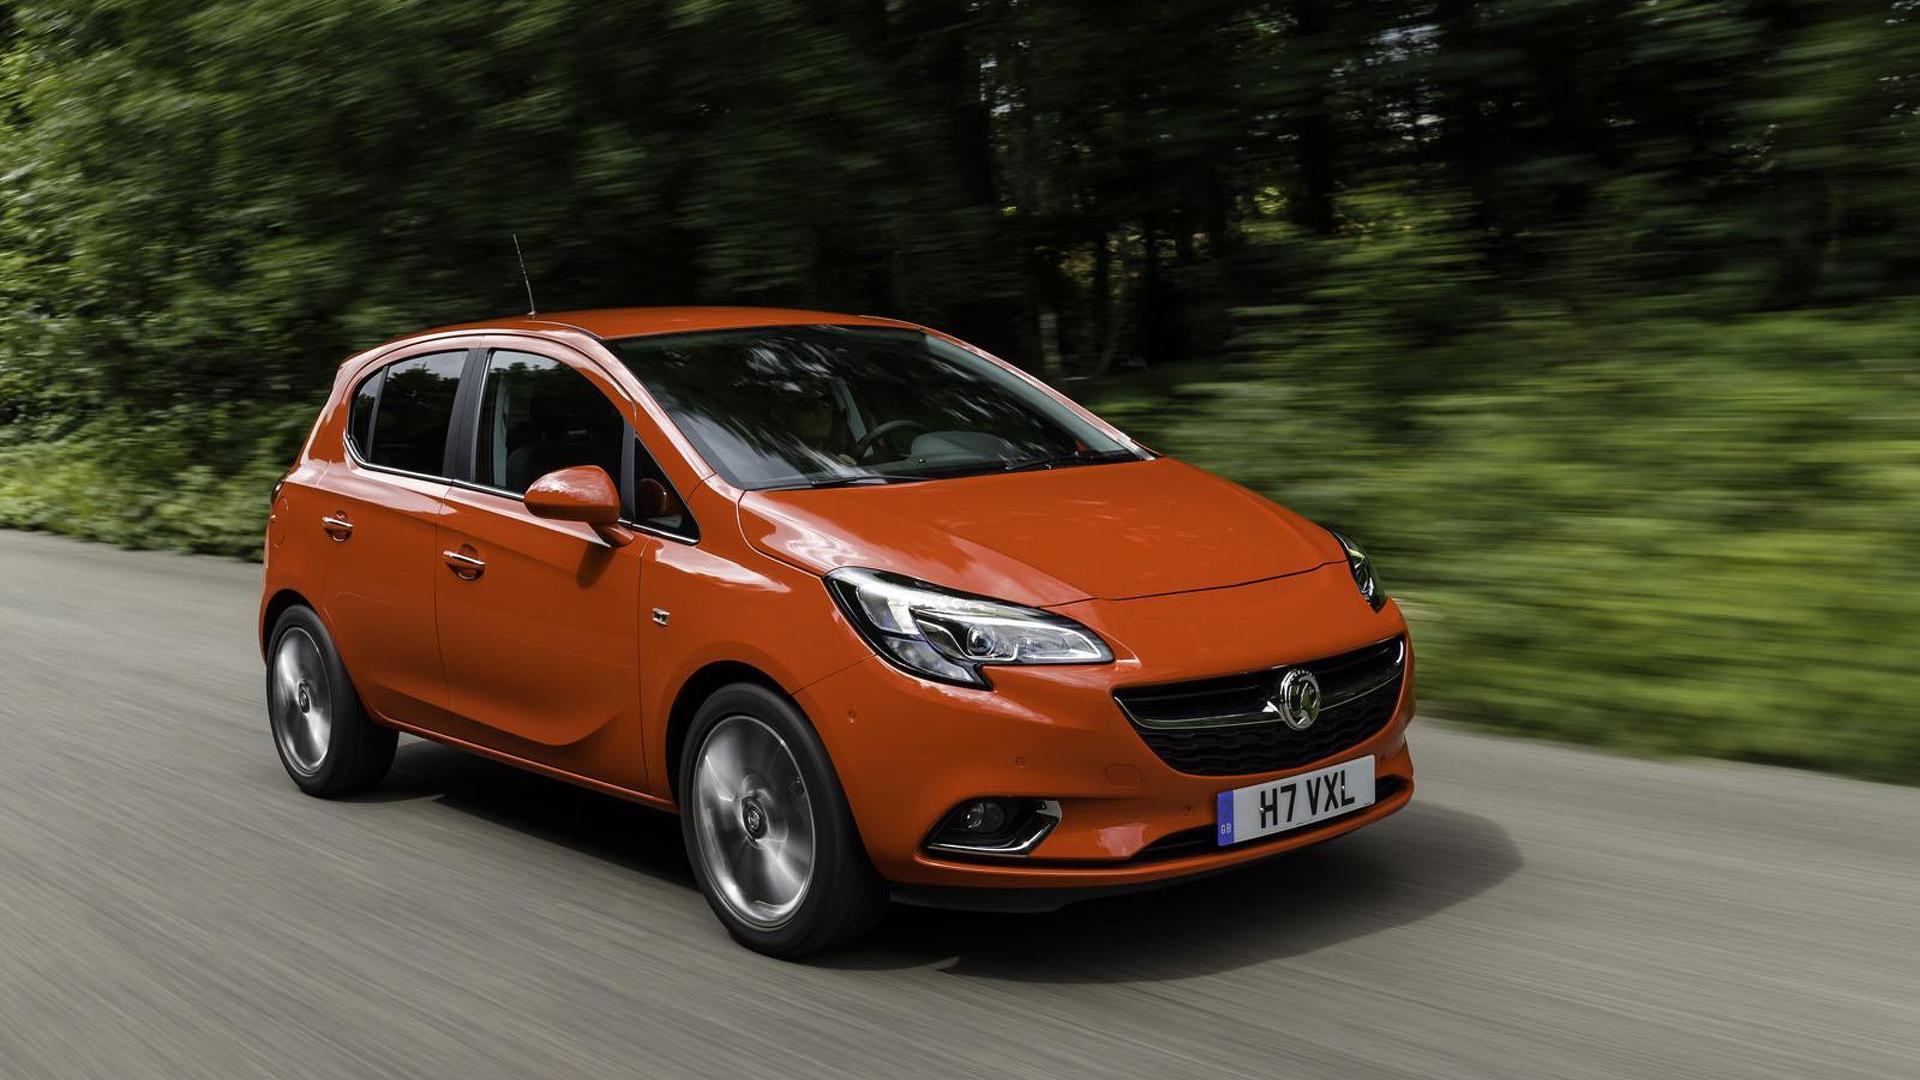 Opel planning Dacia-like range of low-cost models - report